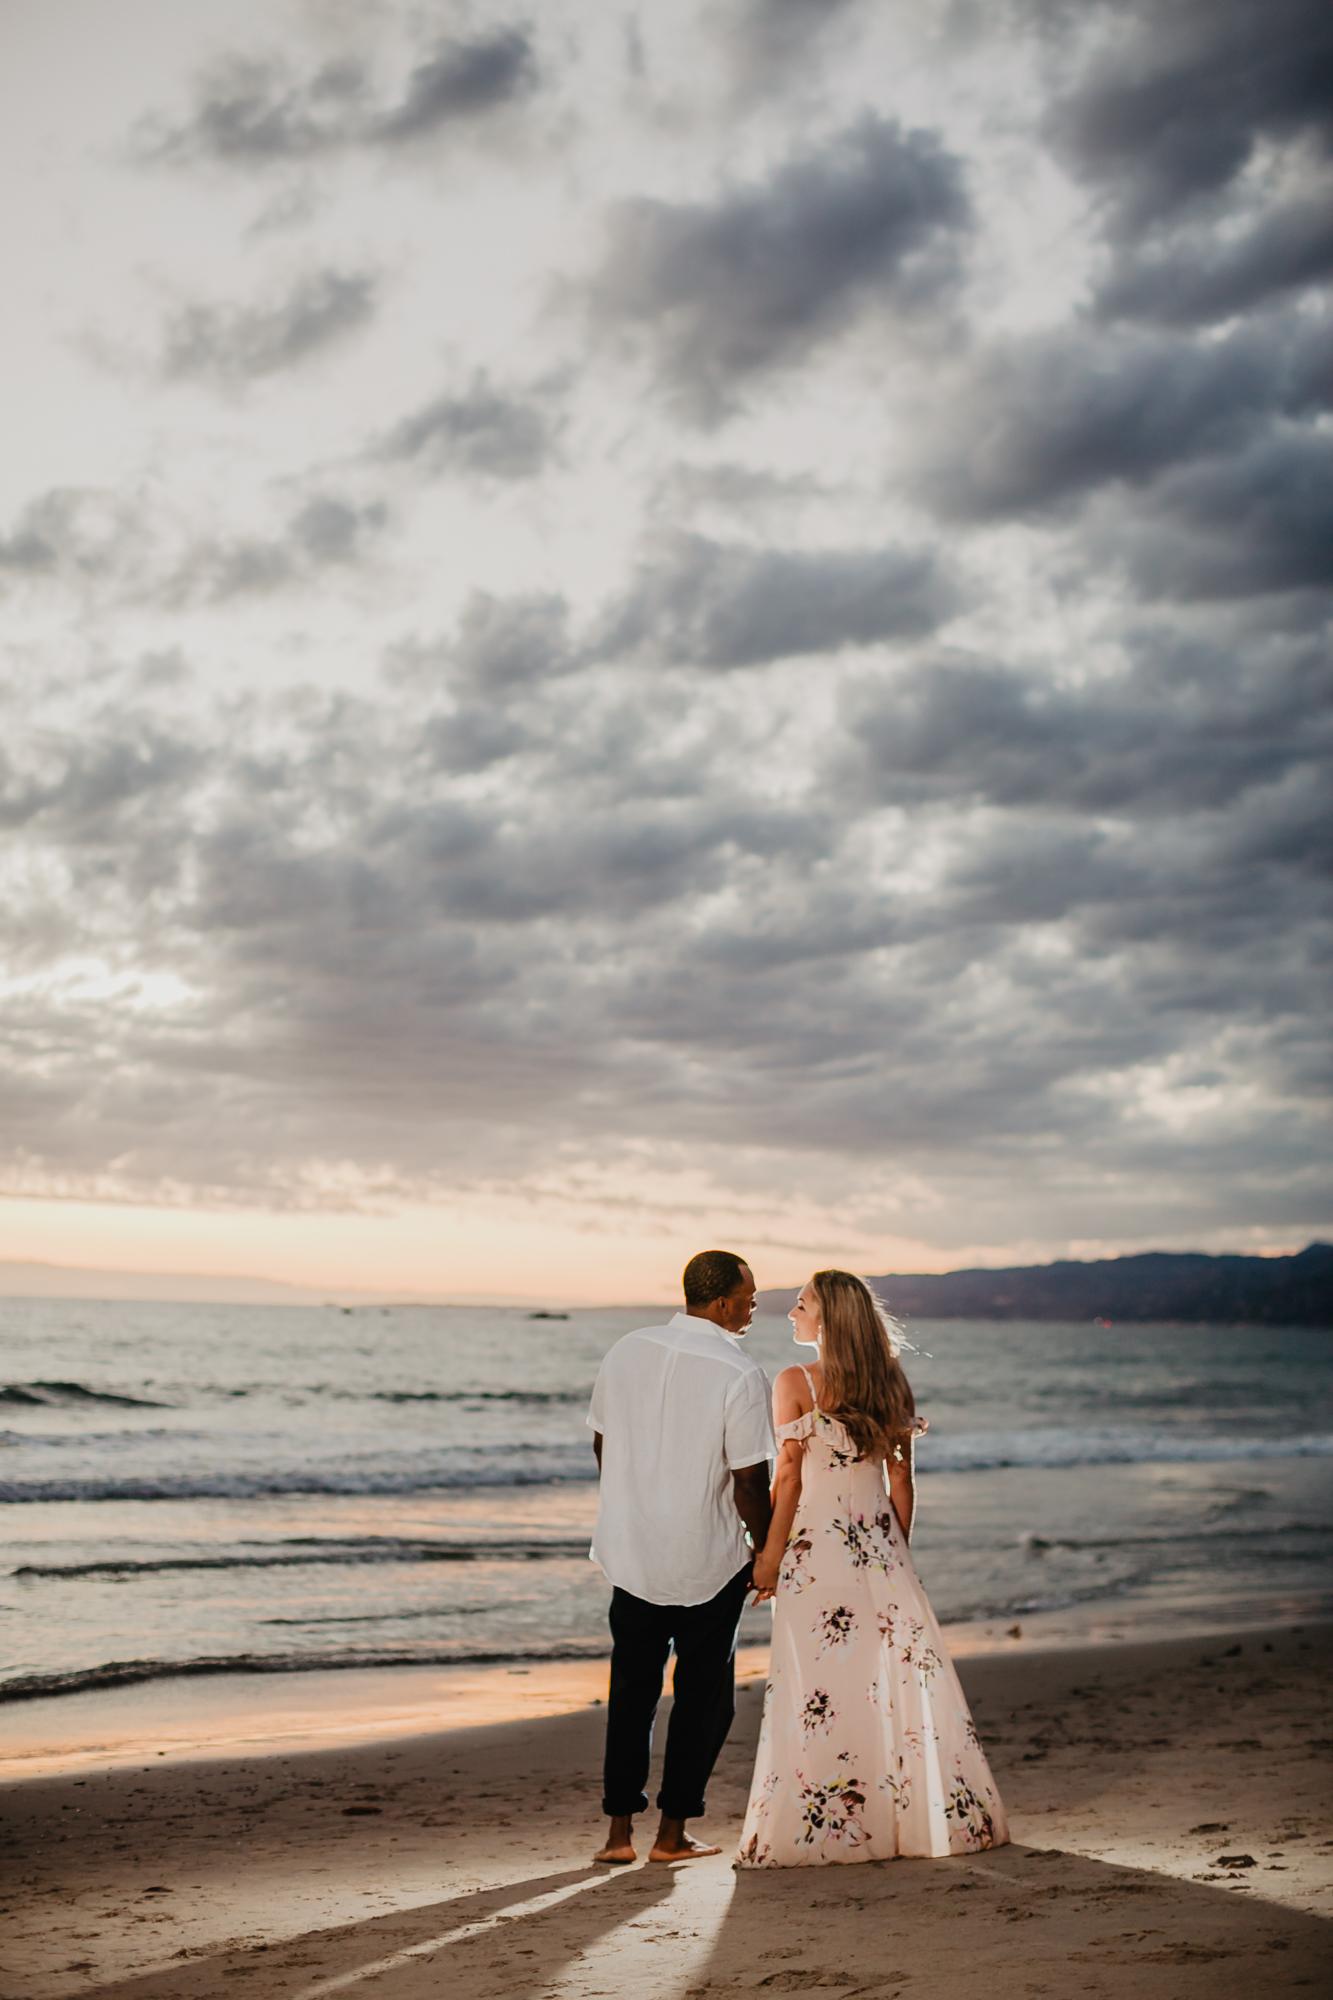 MK-Santa-Monica-Pier-Engagement-Photography 13.jpg